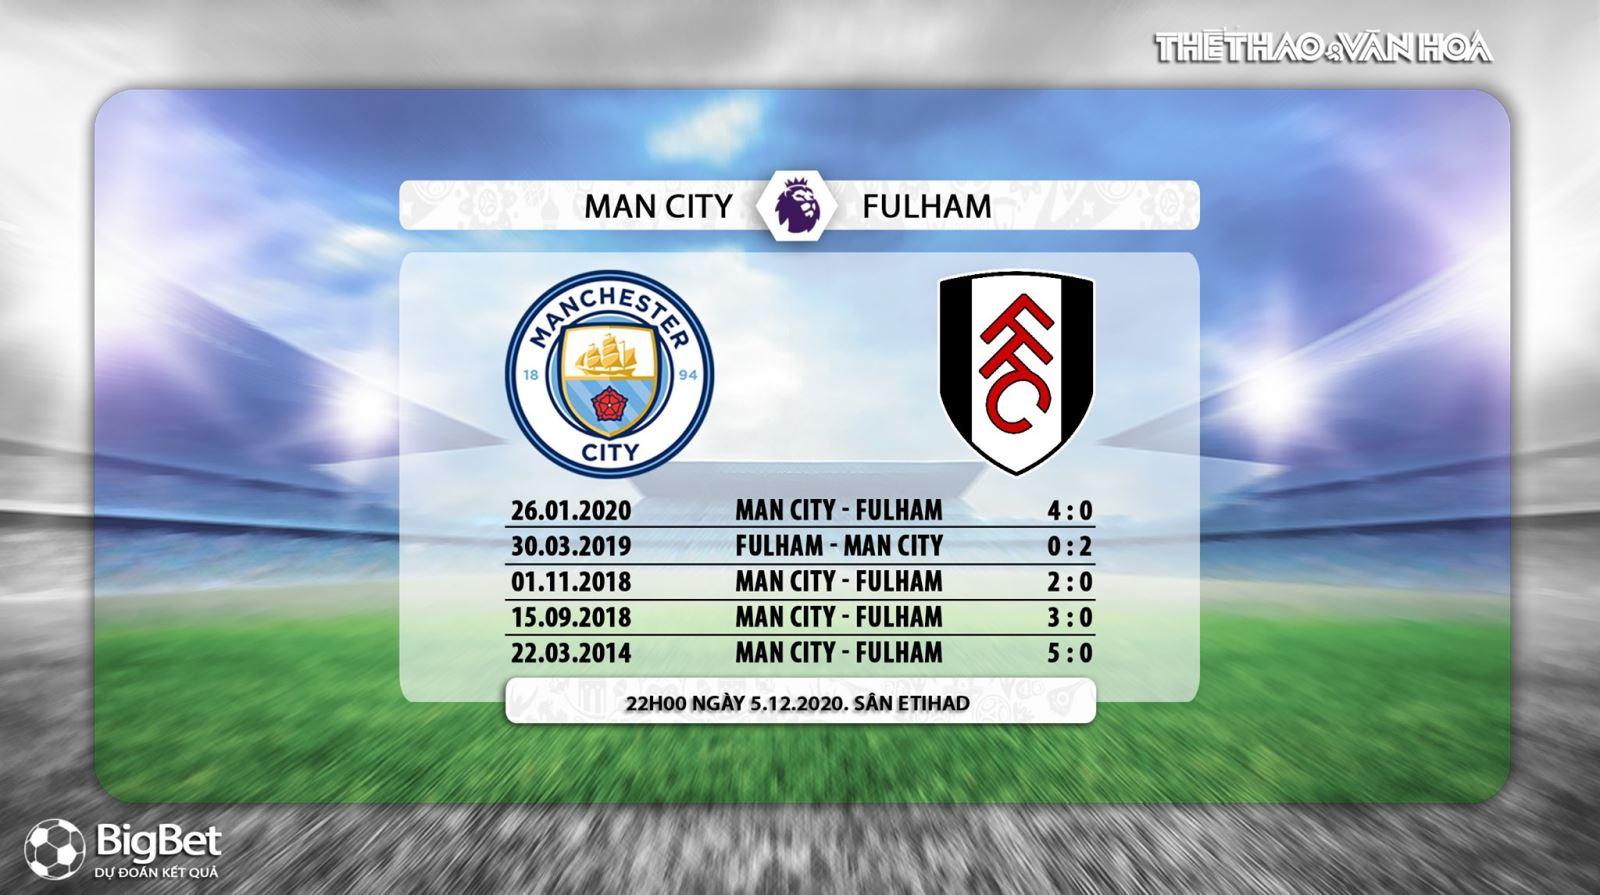 Trực tiếp Man City vs Fulham. Truc tiep bong da. K+PM. Trực tiếp Man City. Trực tiếp K+ PM. Link xem trực tiếp bóng đá Anh. Trực tiếp Fulham đấu với Man City